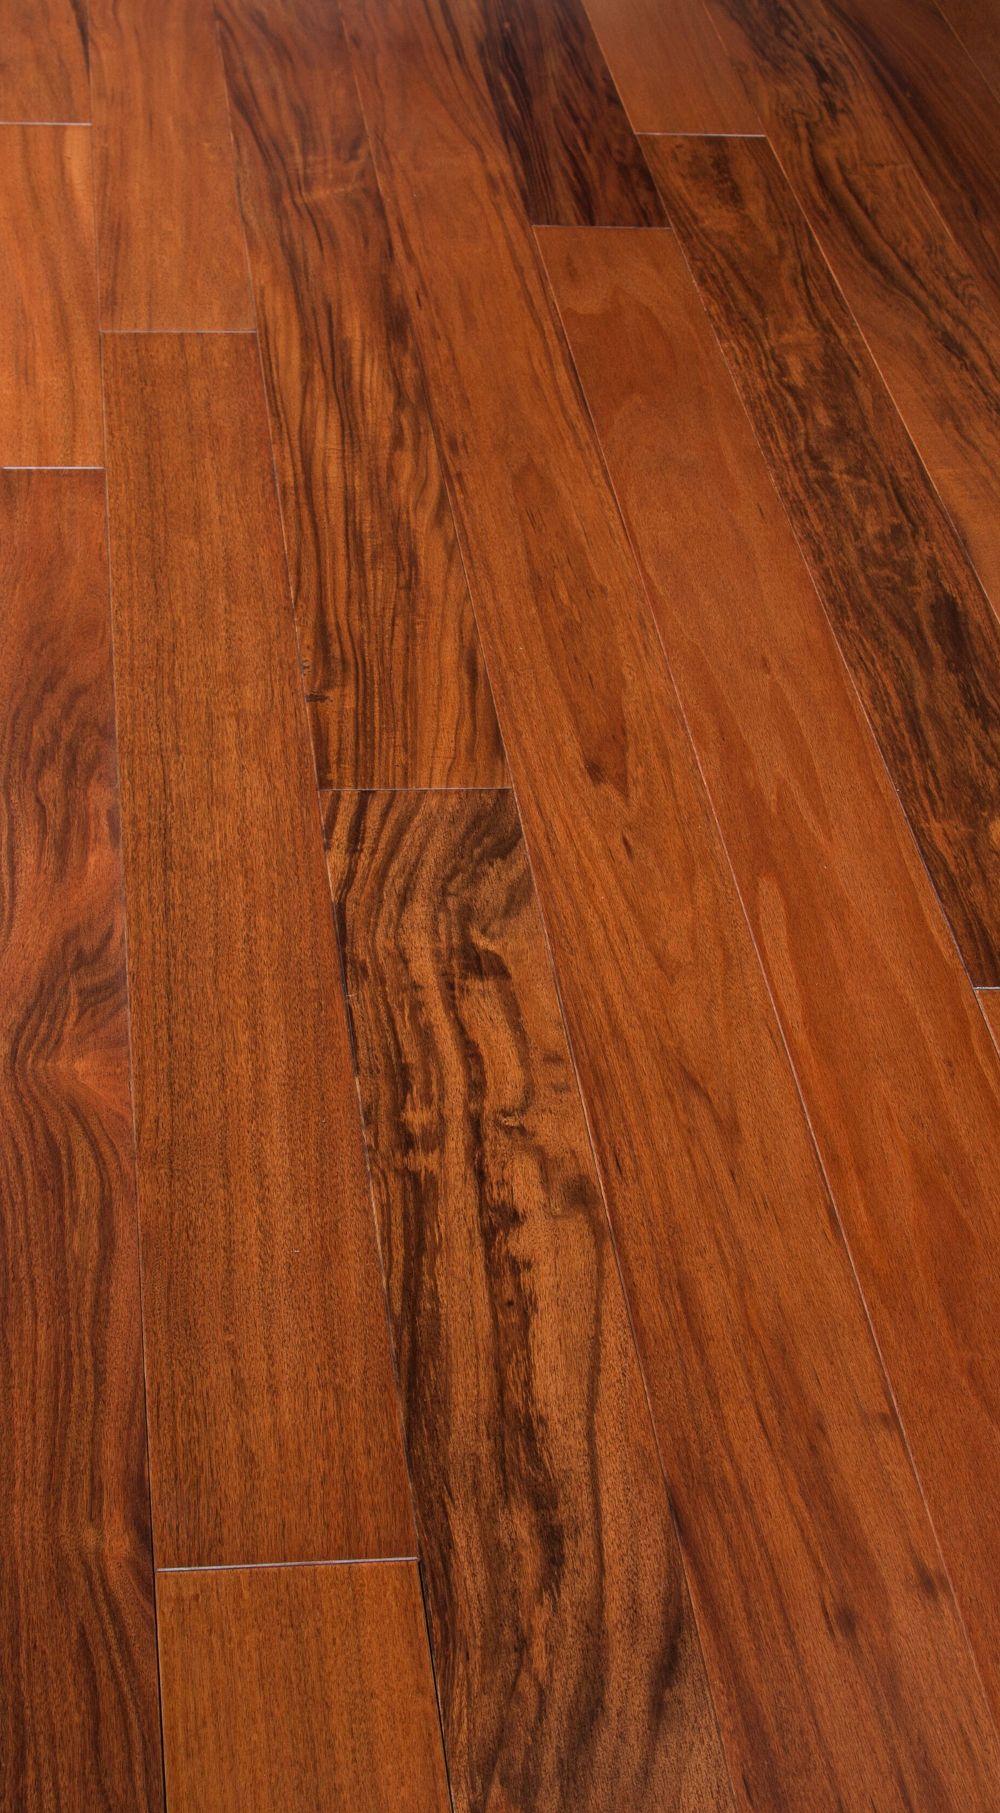 Patagonian Rosewood Dark Fsc Pure Hardwood Flooring 3 4 X 4 X 1